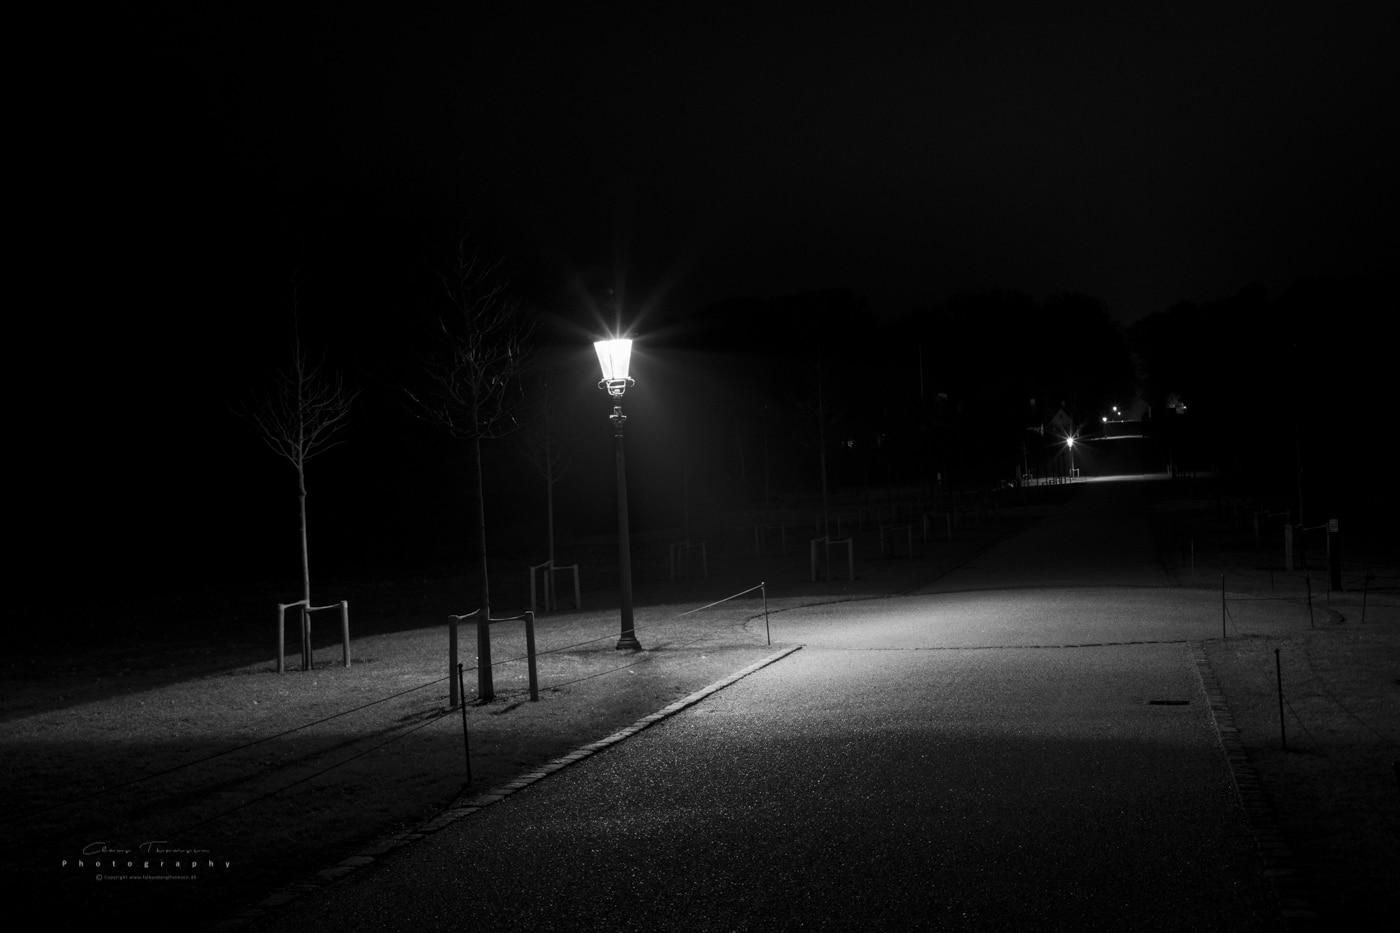 Begrænset lys